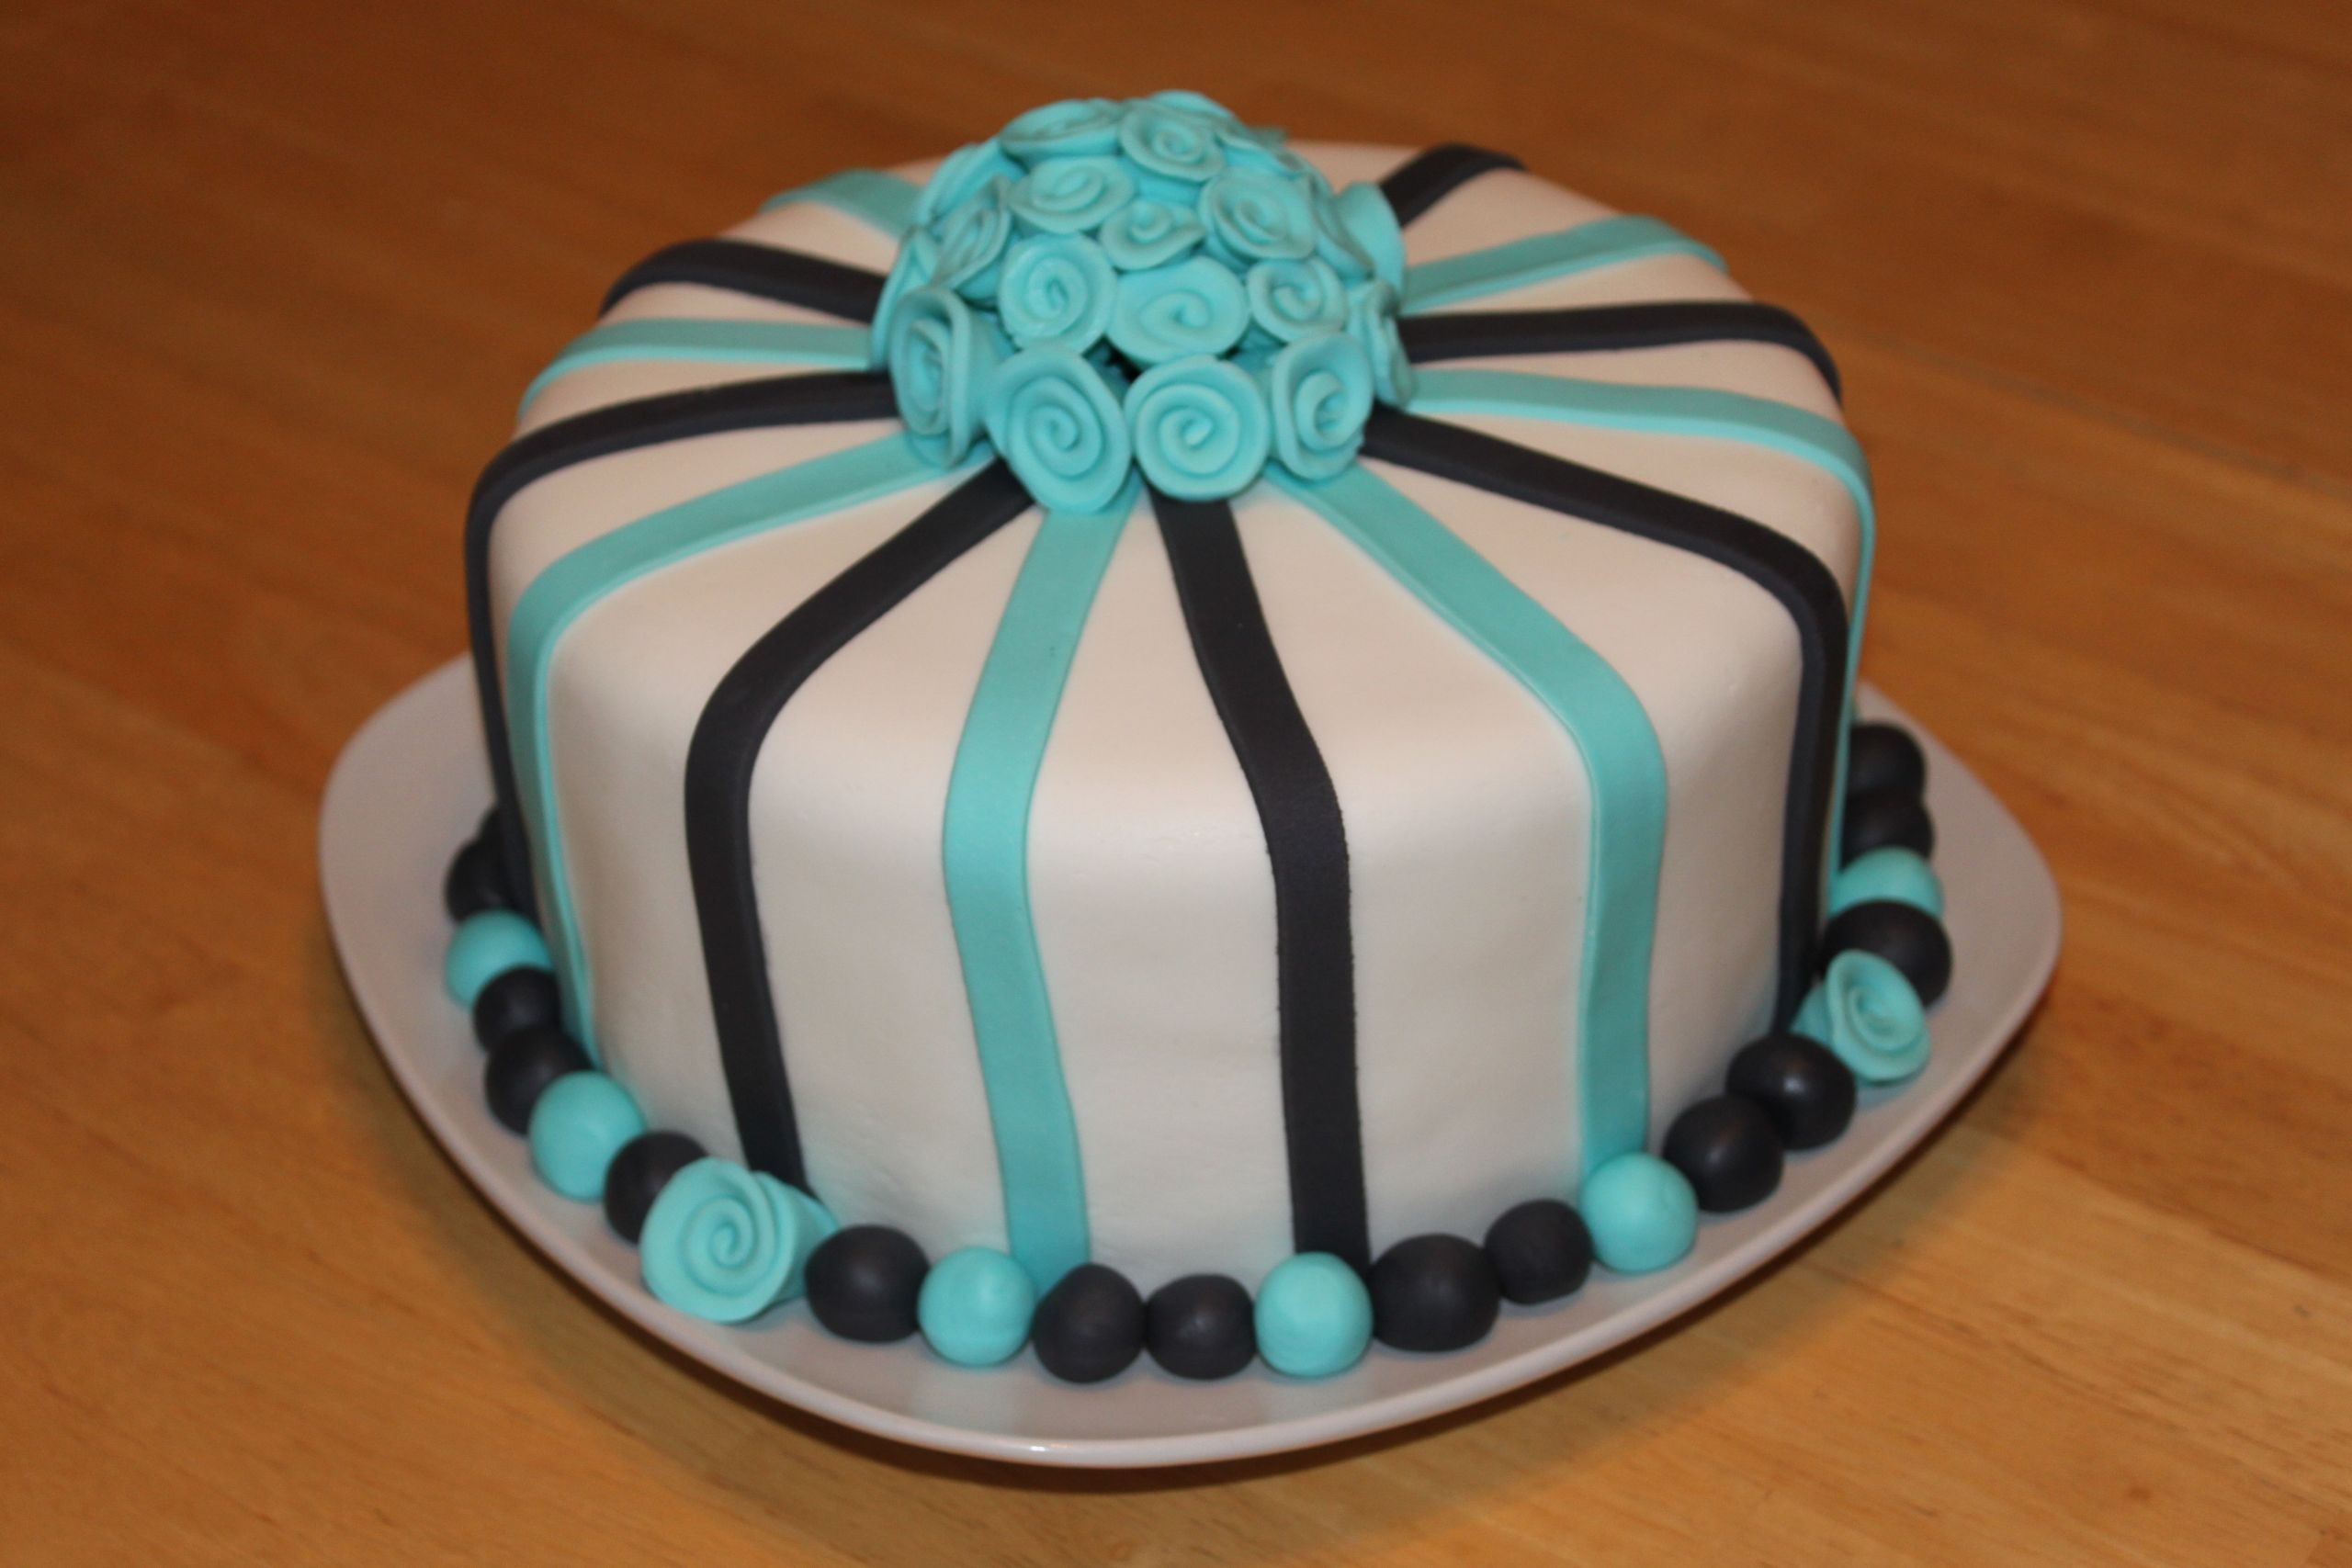 Fondant Birthday Cakes  Blue and Black Striped Birthday Fondant Cake